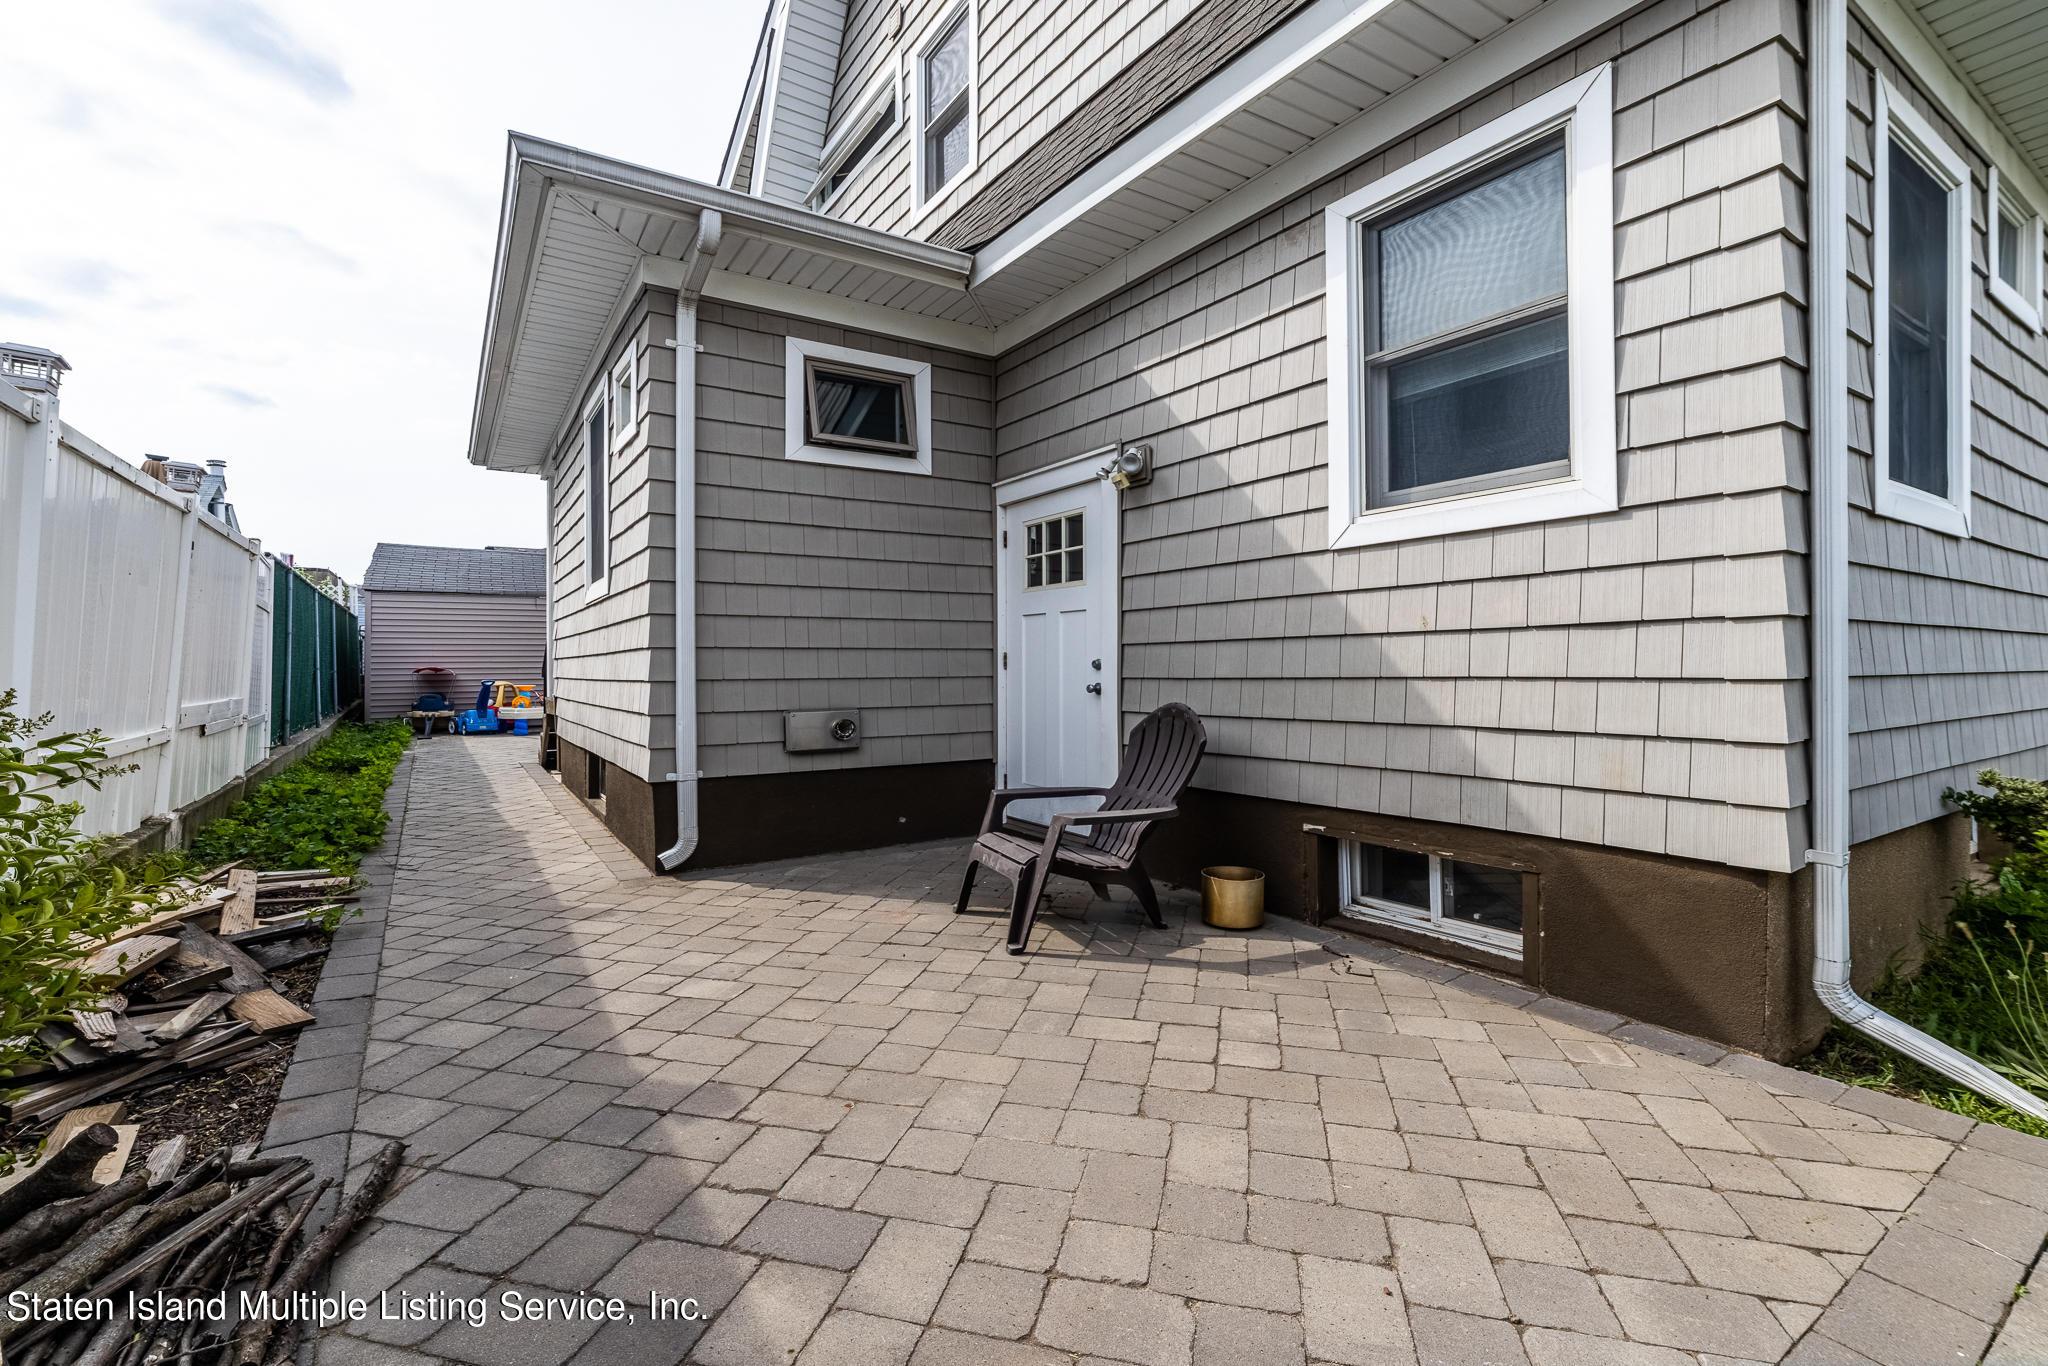 Single Family - Detached 790 New Dorp Lane  Staten Island, NY 10306, MLS-1146574-32